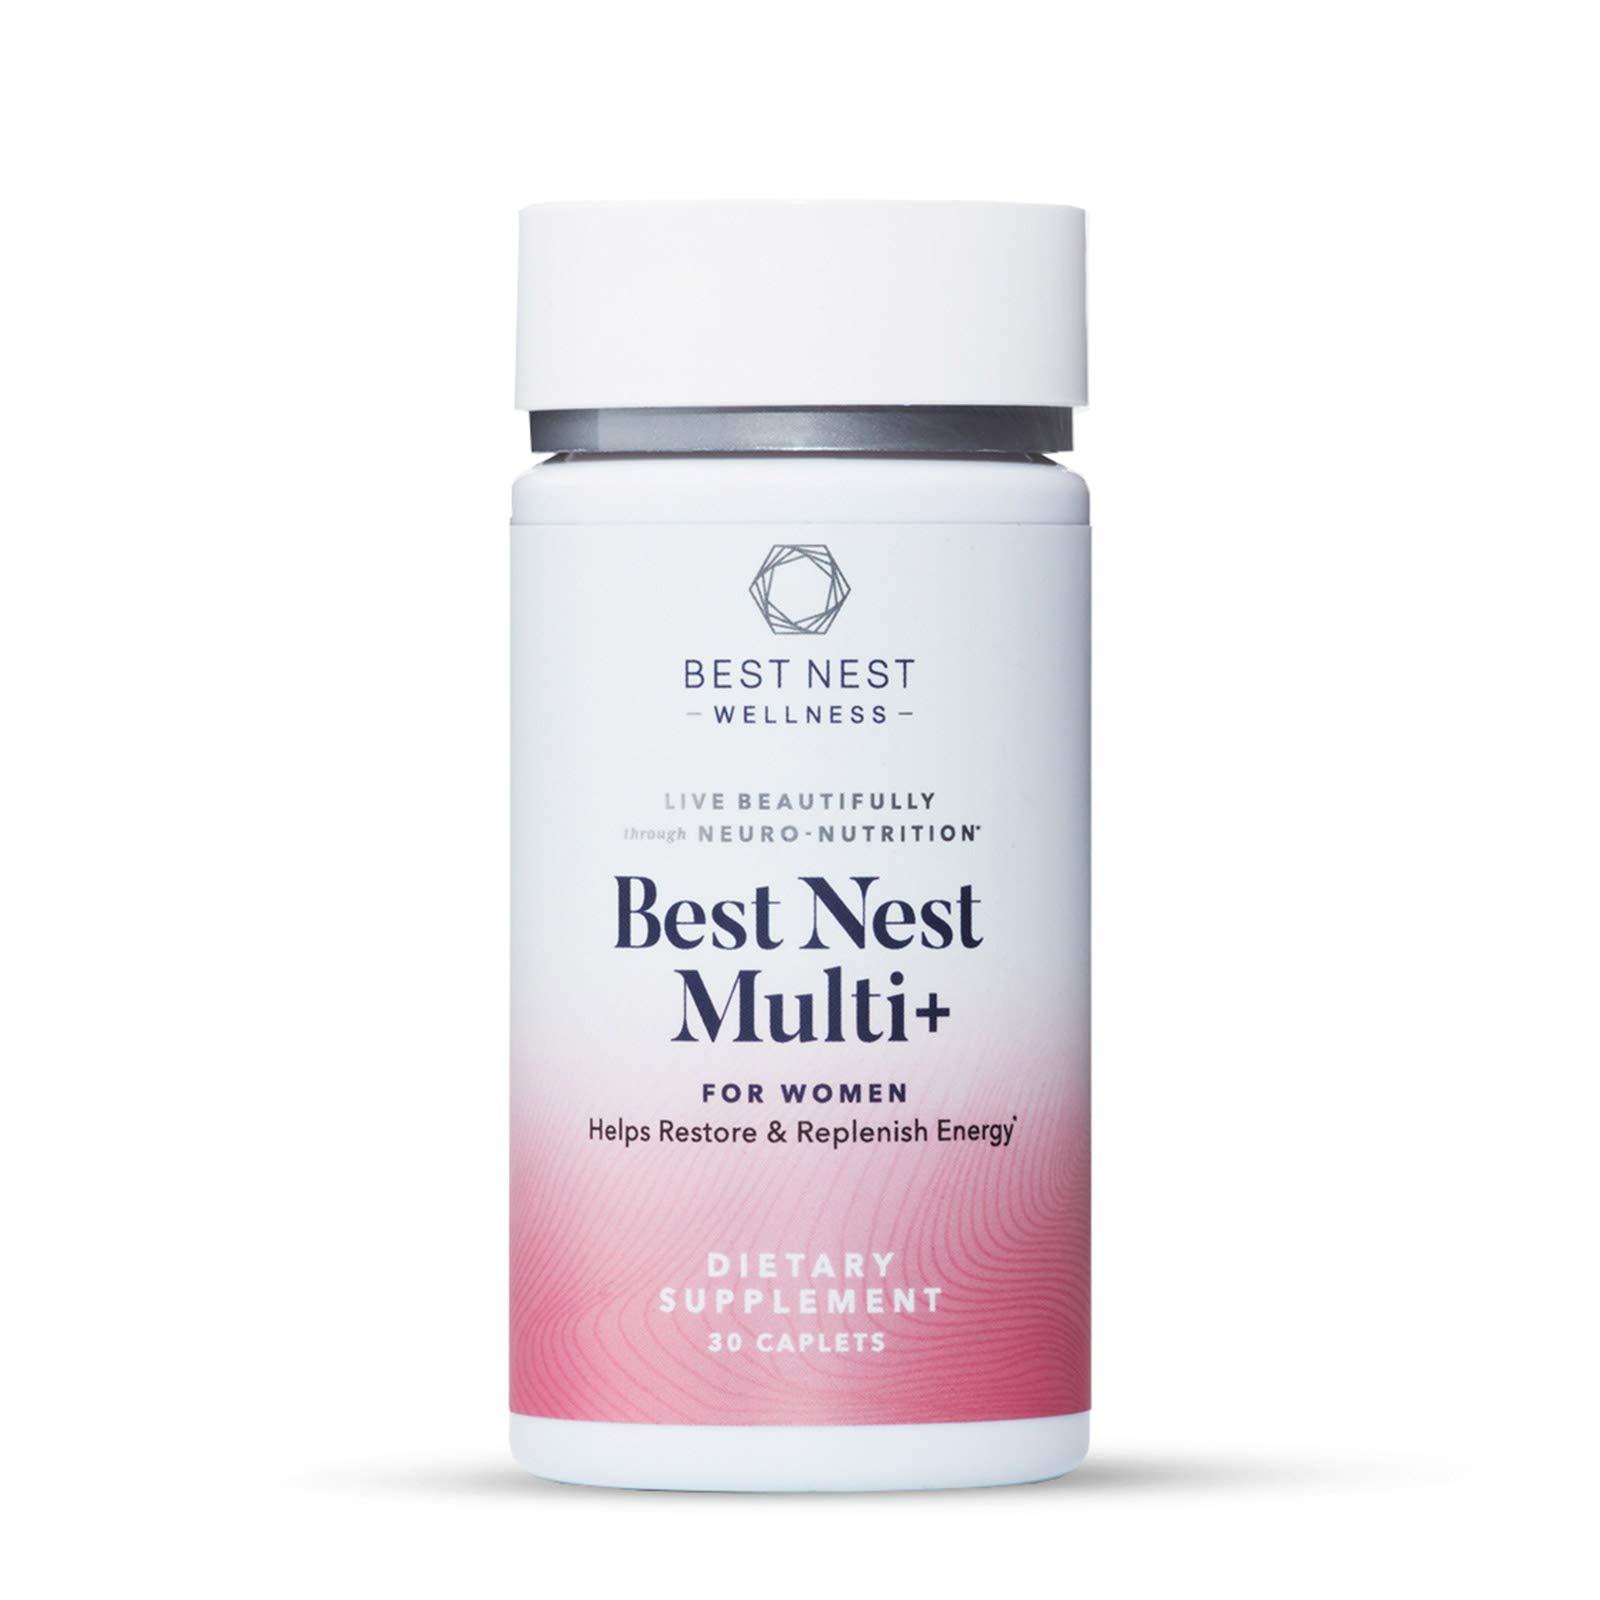 Best Nest Women's Multi+, Methylfolate, Methylcobalamin (B12), Vegan Multivitamins, Probiotics, Natural Whole Food Organic Blend, Once Daily Multivitamin, Immune Support, 30 Ct, Best Nest Wellness